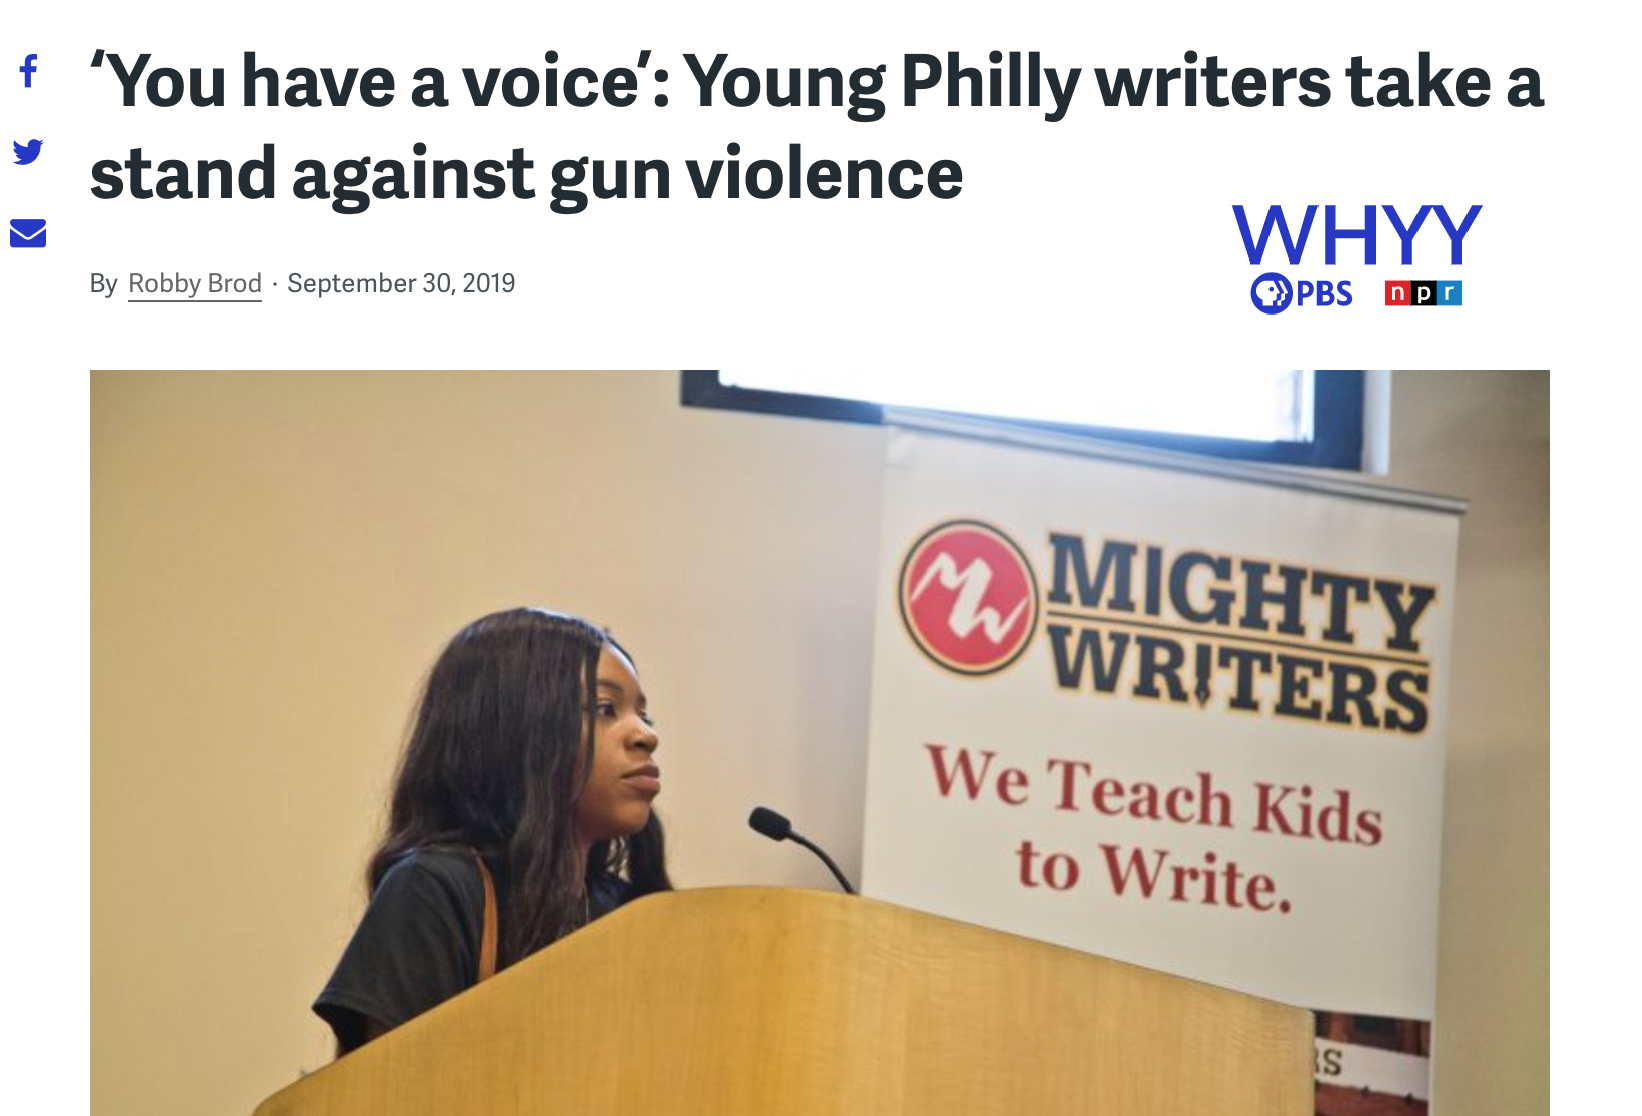 WHYY Gun Violence Article